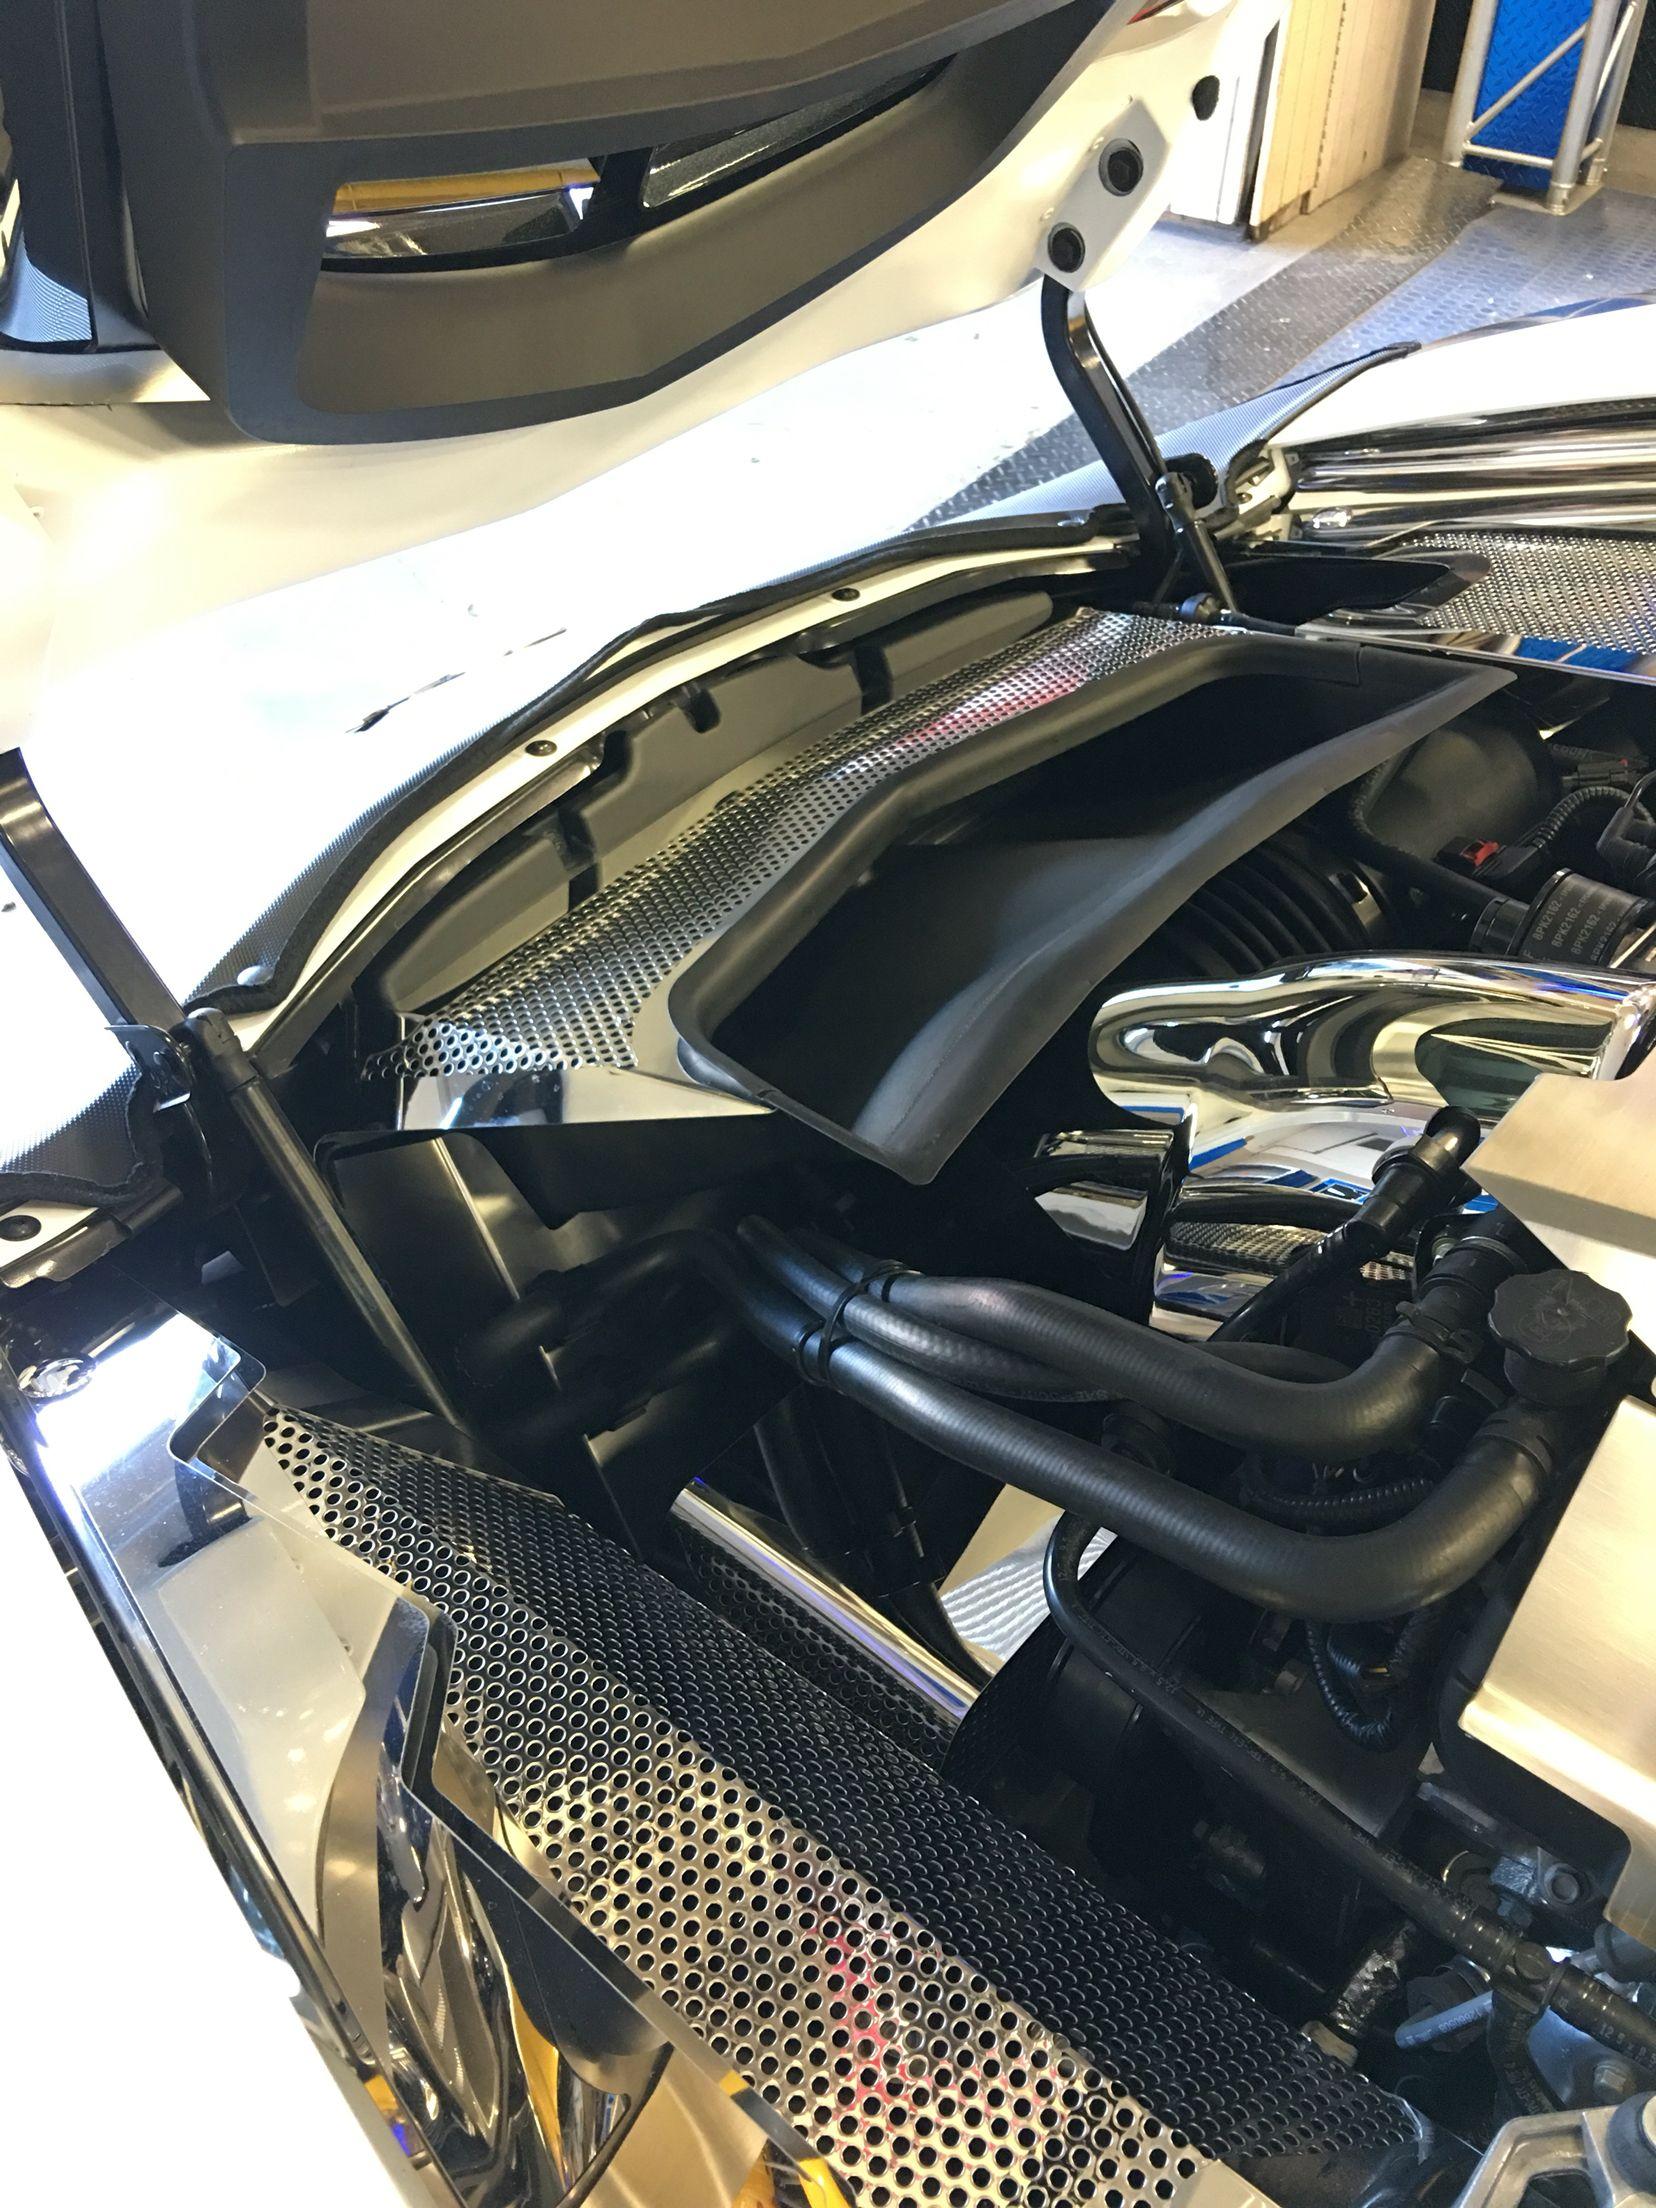 New For The Corvette C7 And Corvette Z06 Fan Shroud And Abs Covers Corvette Accessories Corvette C7 Corvette C7 Stingray